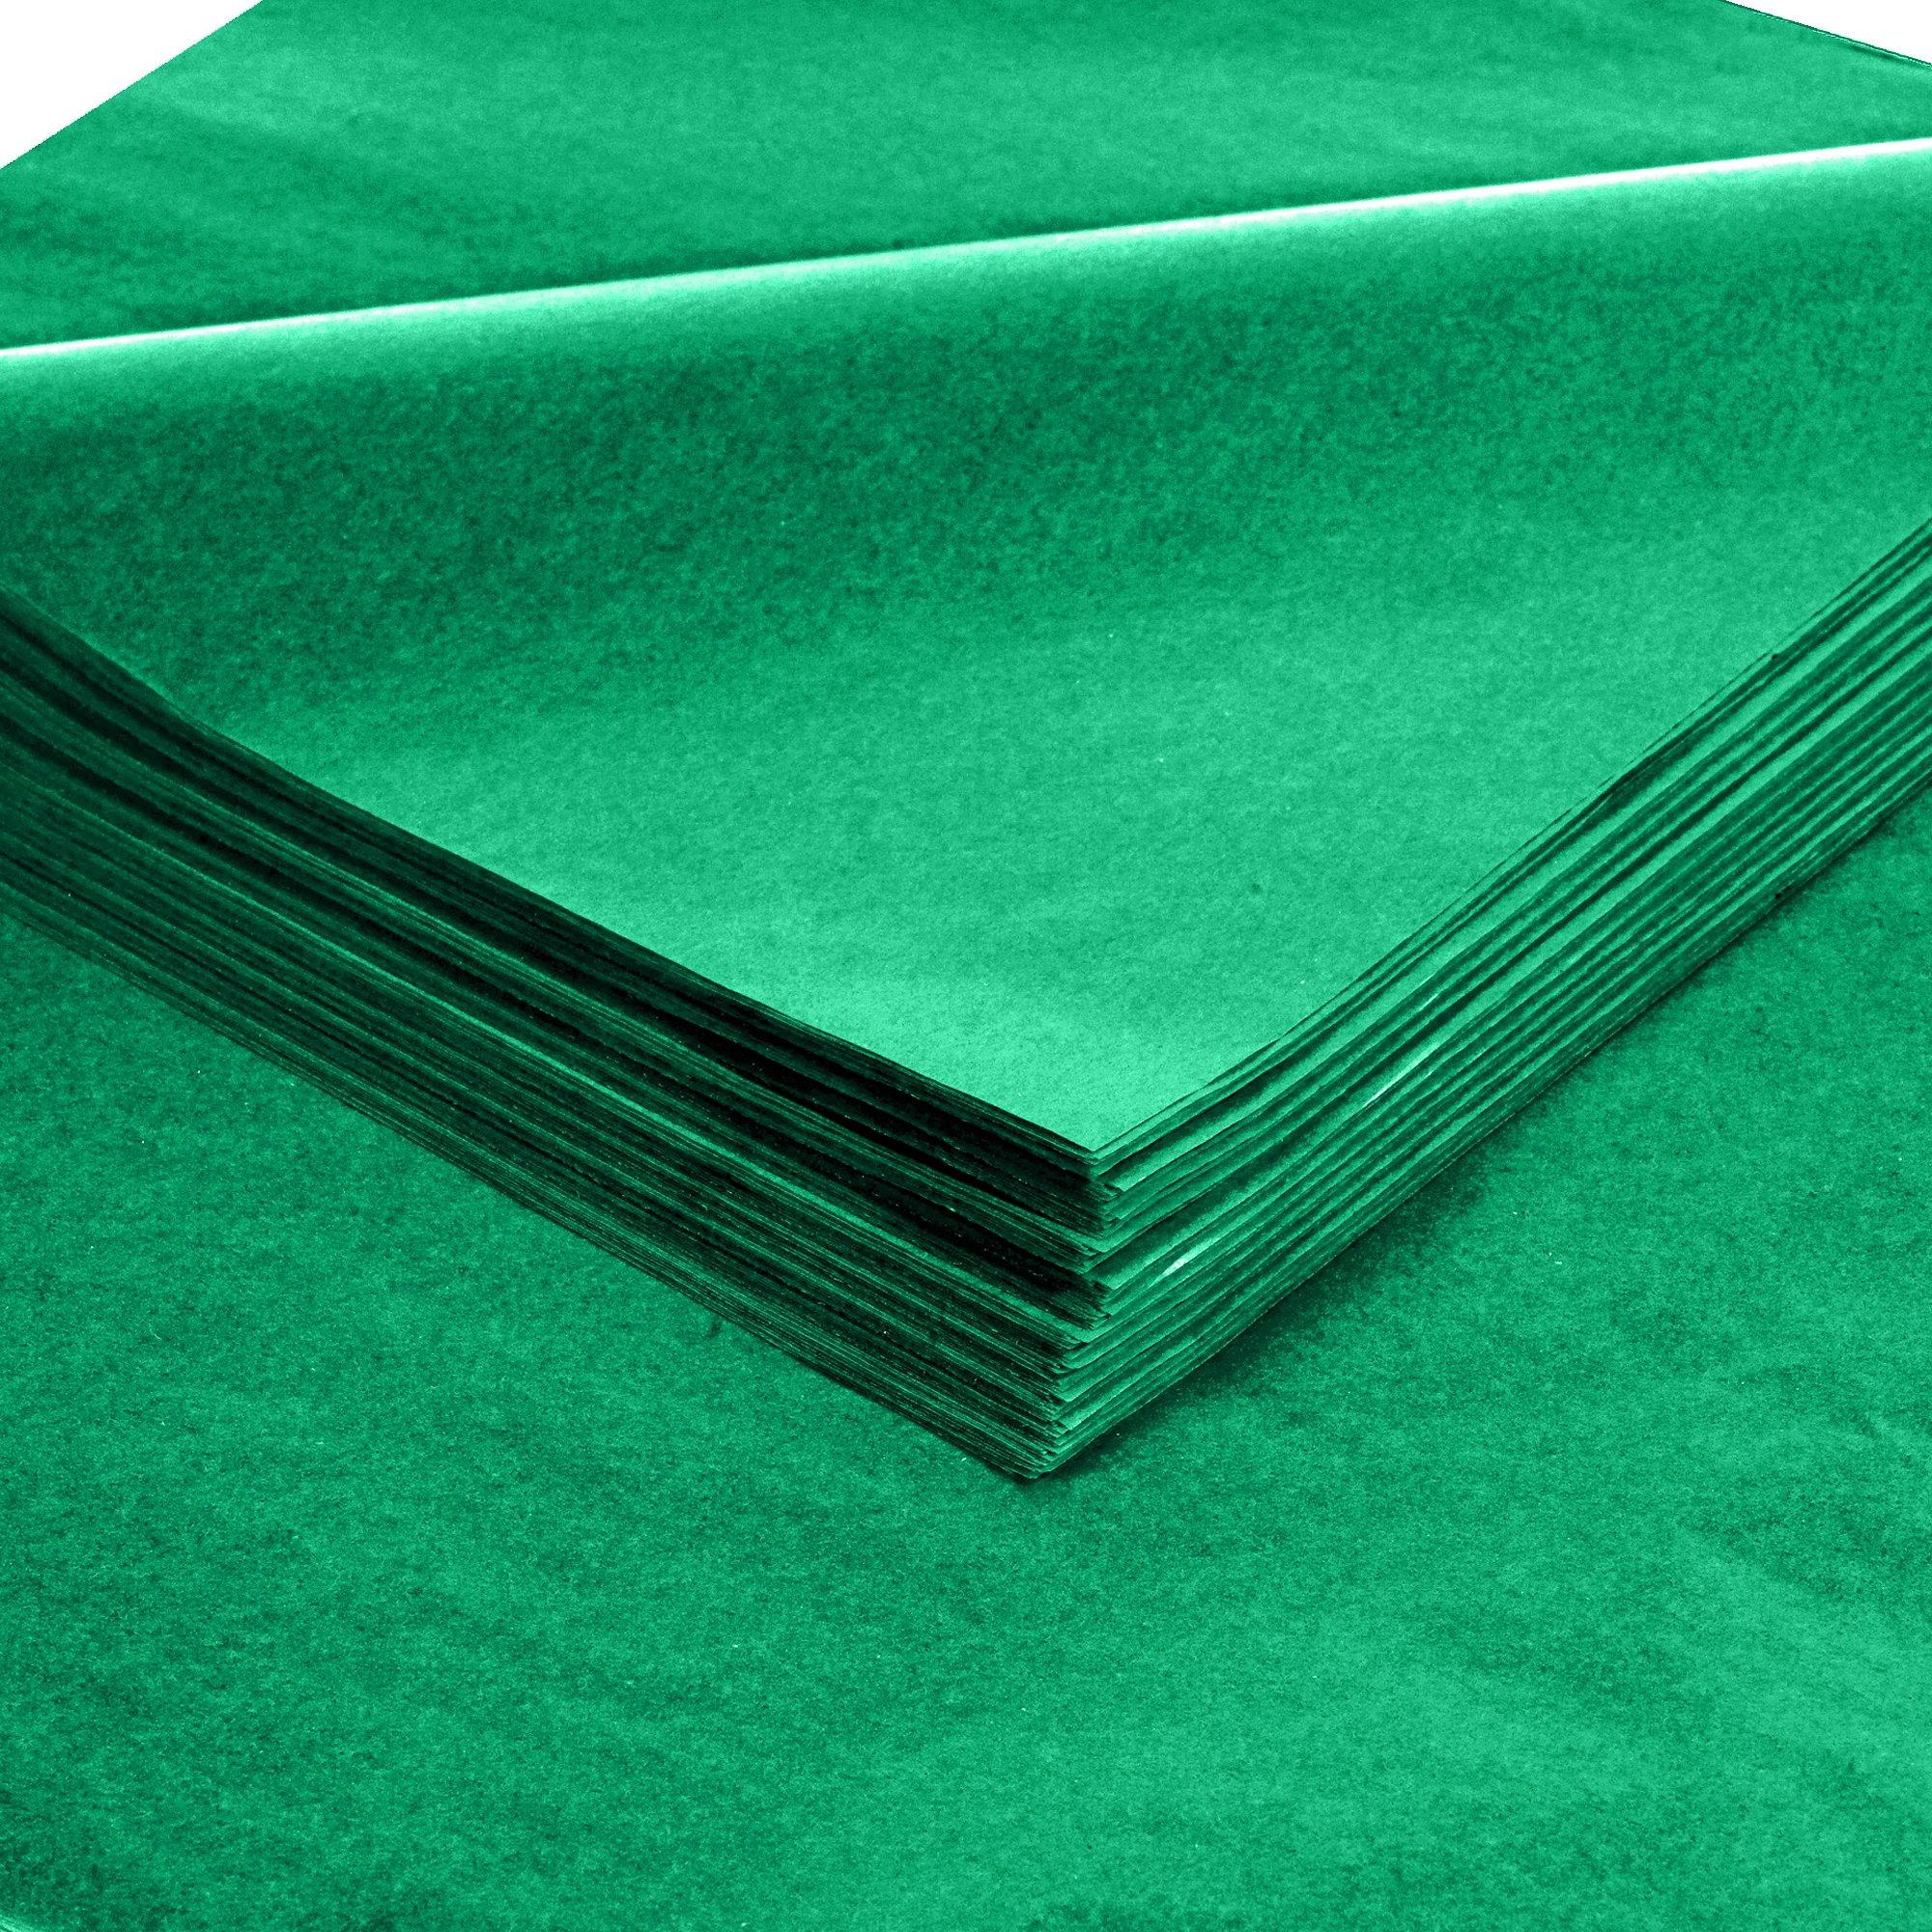 BOX USA BT2030B Tissue Paper Gift Grade Plum Pack of 480 20 x 30